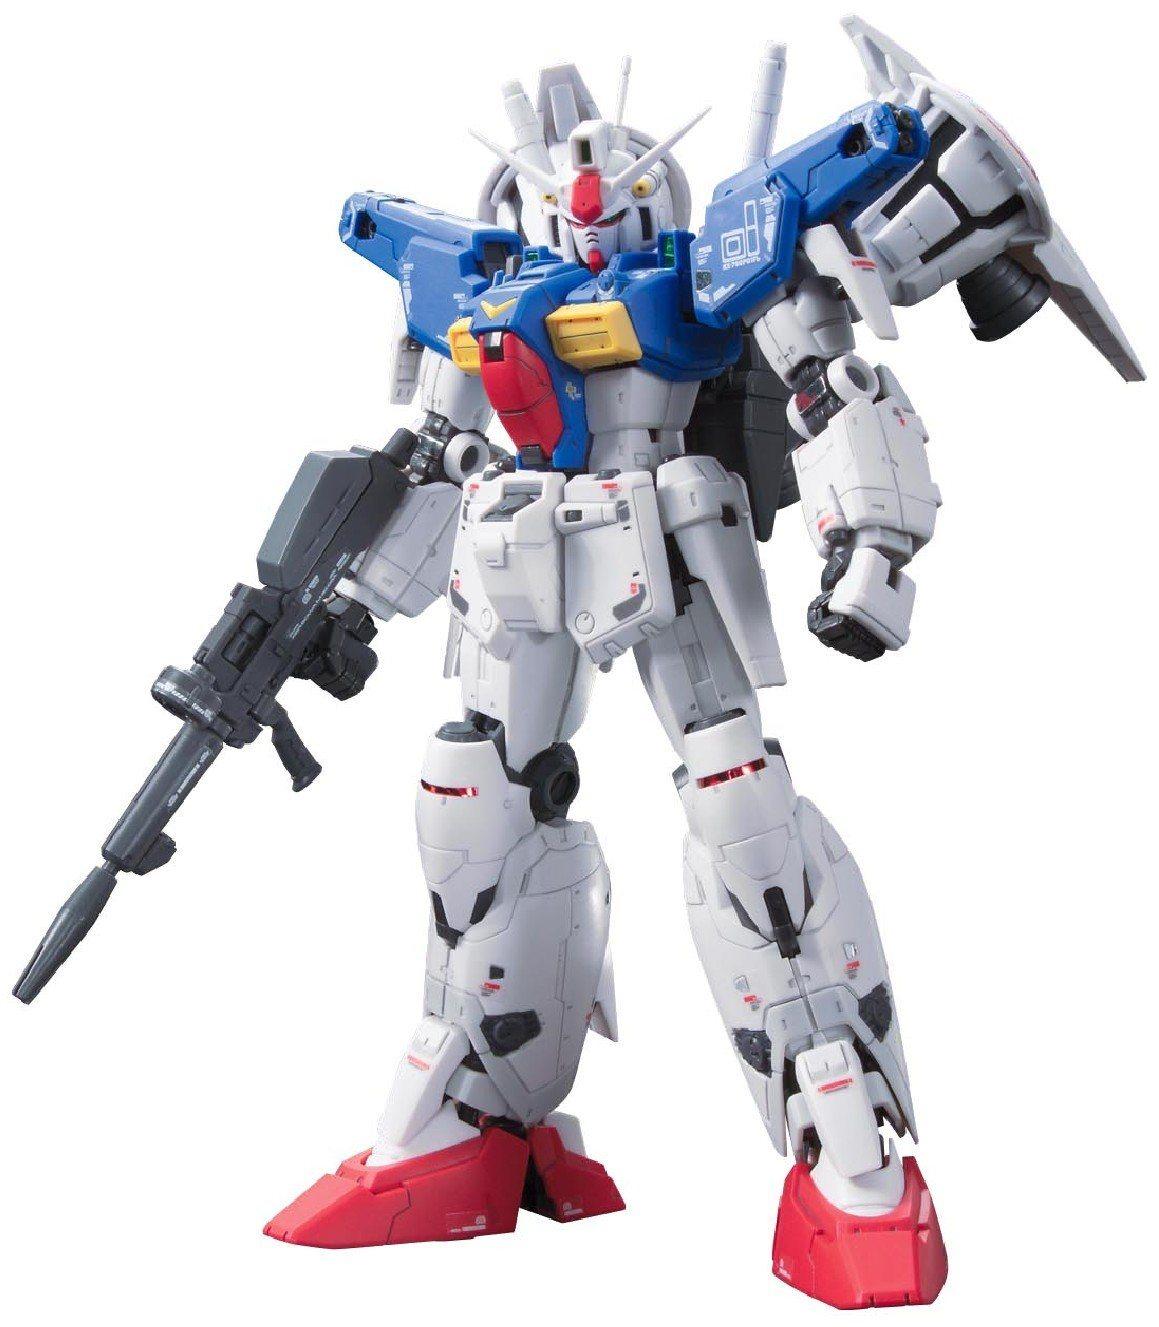 "Bandai/Gundam Wing #13 Rx-78 Gp01-Fb Gundam Rg Model Kit, From \""Zephyranthes\"""